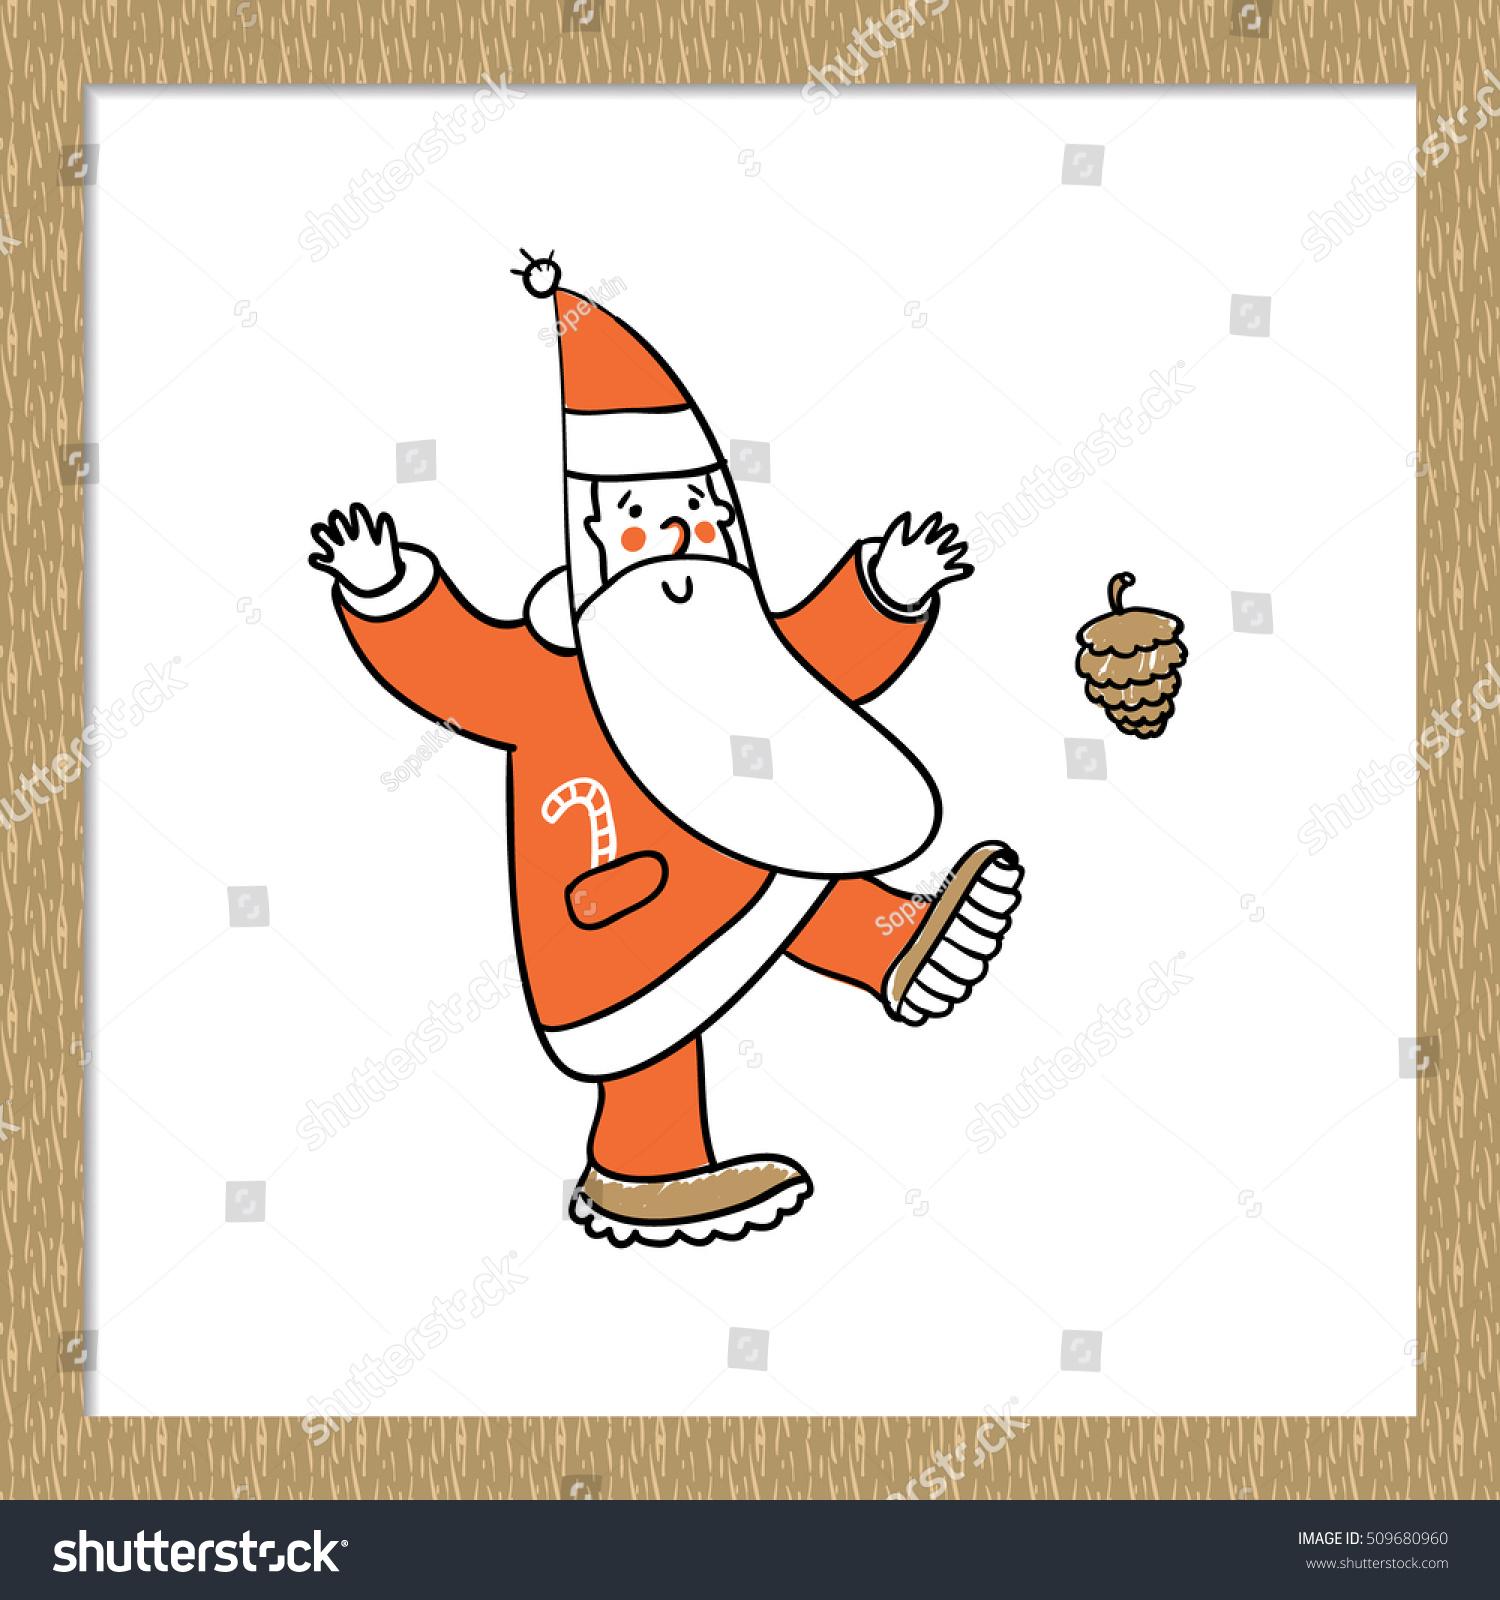 Beautiful festive decoration dancing santa claus stock vector beautiful festive decoration dancing santa claus kicking cone vector element for holiday decorating greeting kristyandbryce Gallery